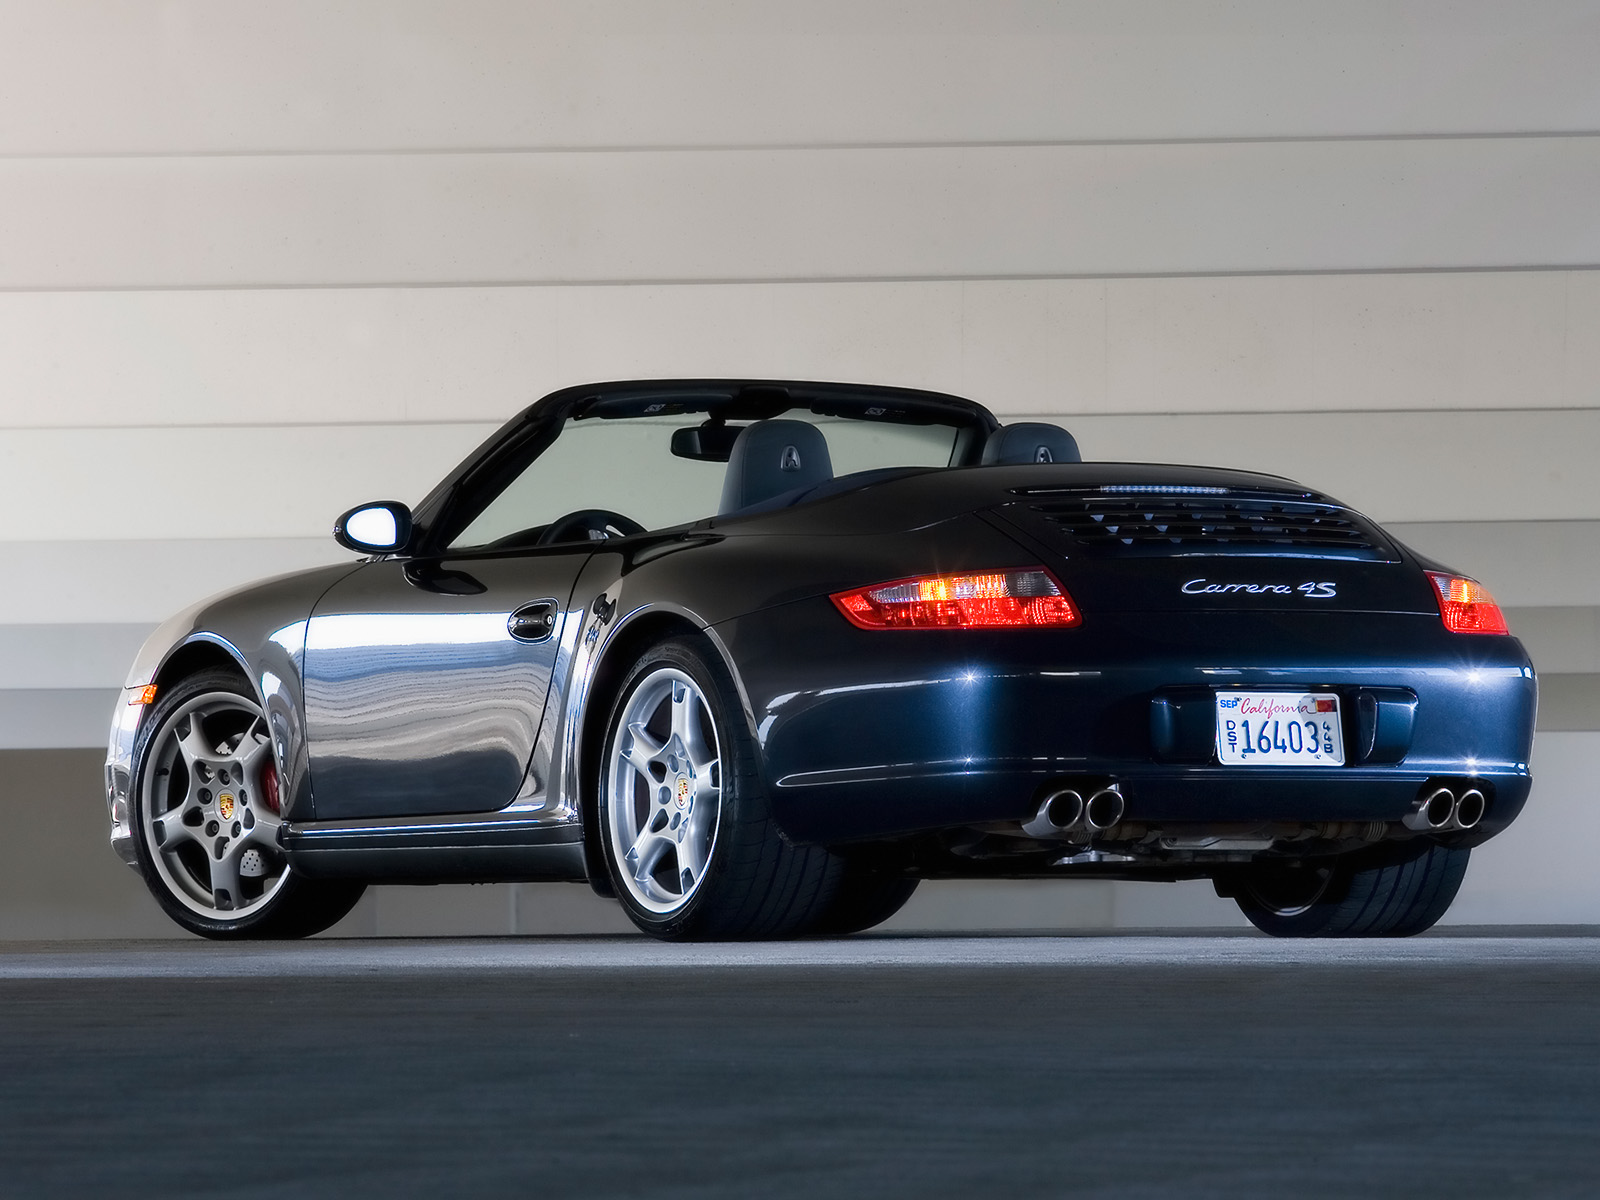 porsche 911 carrera 4s cabriolet picture 43917 porsche. Black Bedroom Furniture Sets. Home Design Ideas